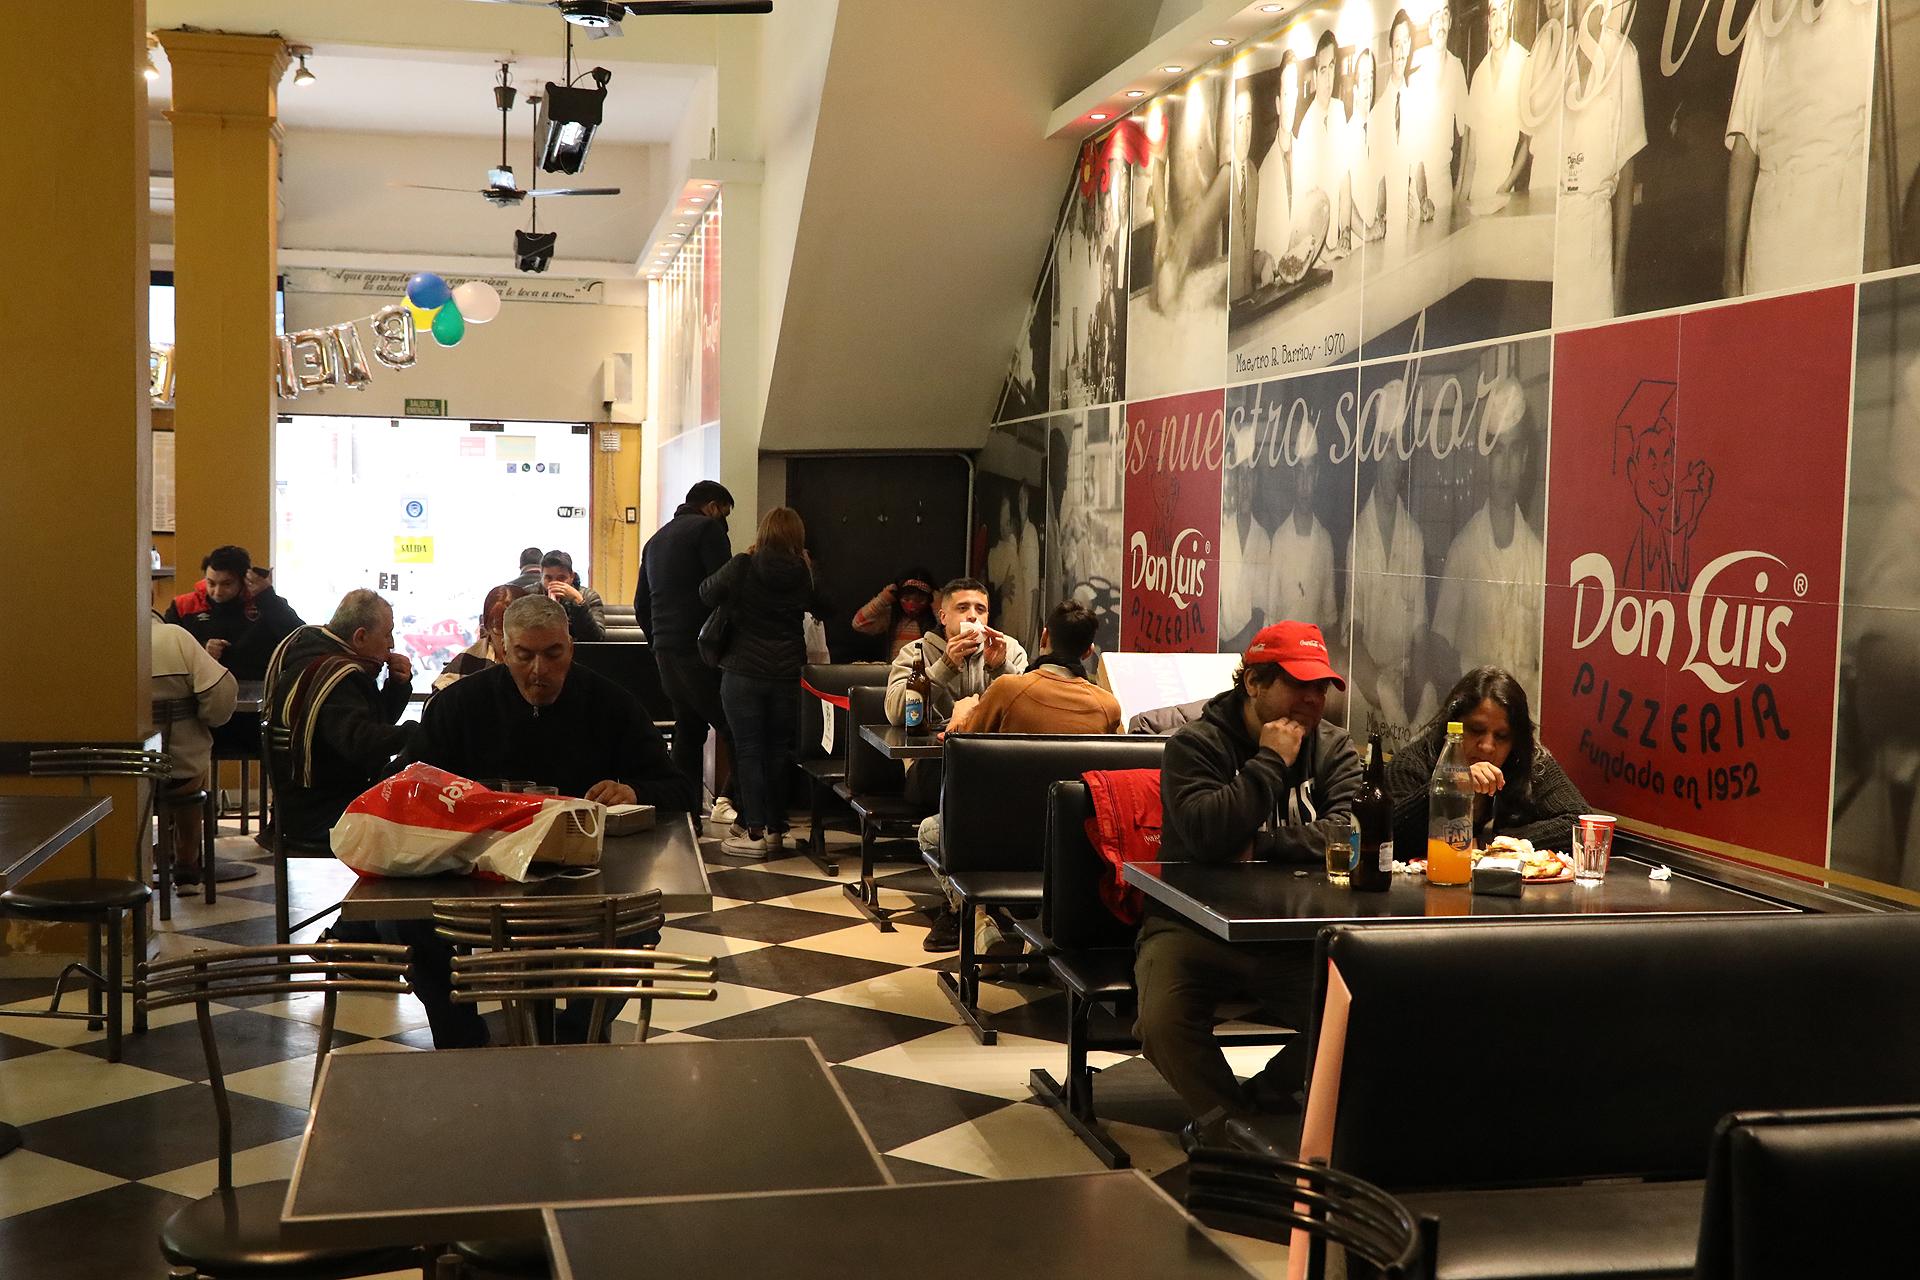 El titular del COE, Juan Ledesma indicó que los bares y restaurantes podrán trabajar de 10 a 23 horas